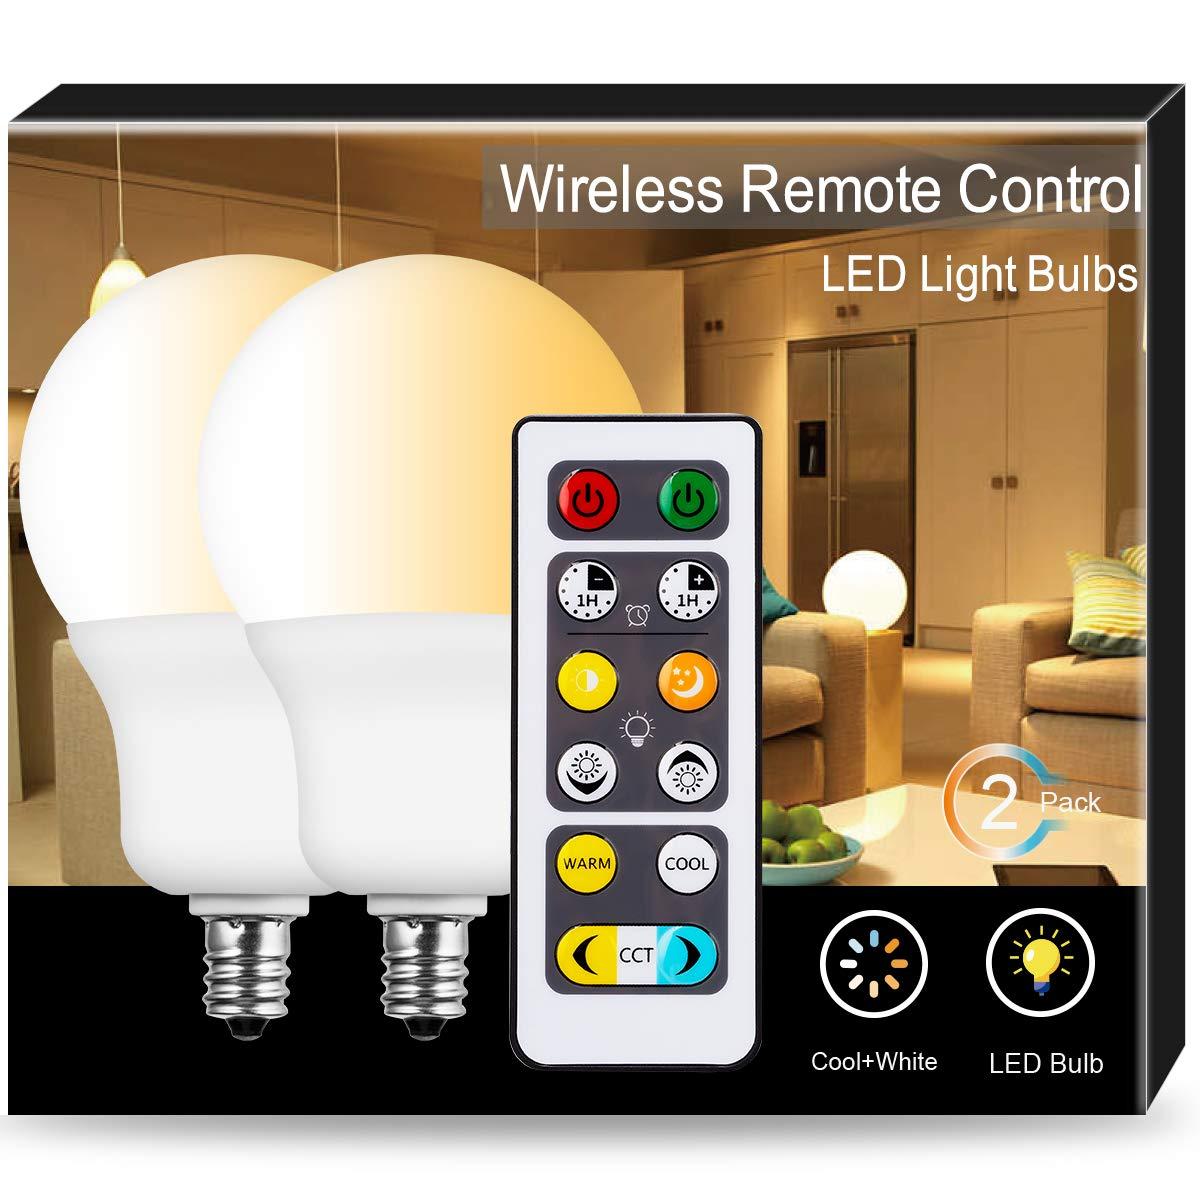 JandCase 調整可能 LED電球 A19 調光機能付き電球 6W リモコン付き燭台電球 60W相当 温白色 2700K-6500K 500lm 家庭/オフィス照明用CCTライト E12ベース 2個パック B07L87VCPD